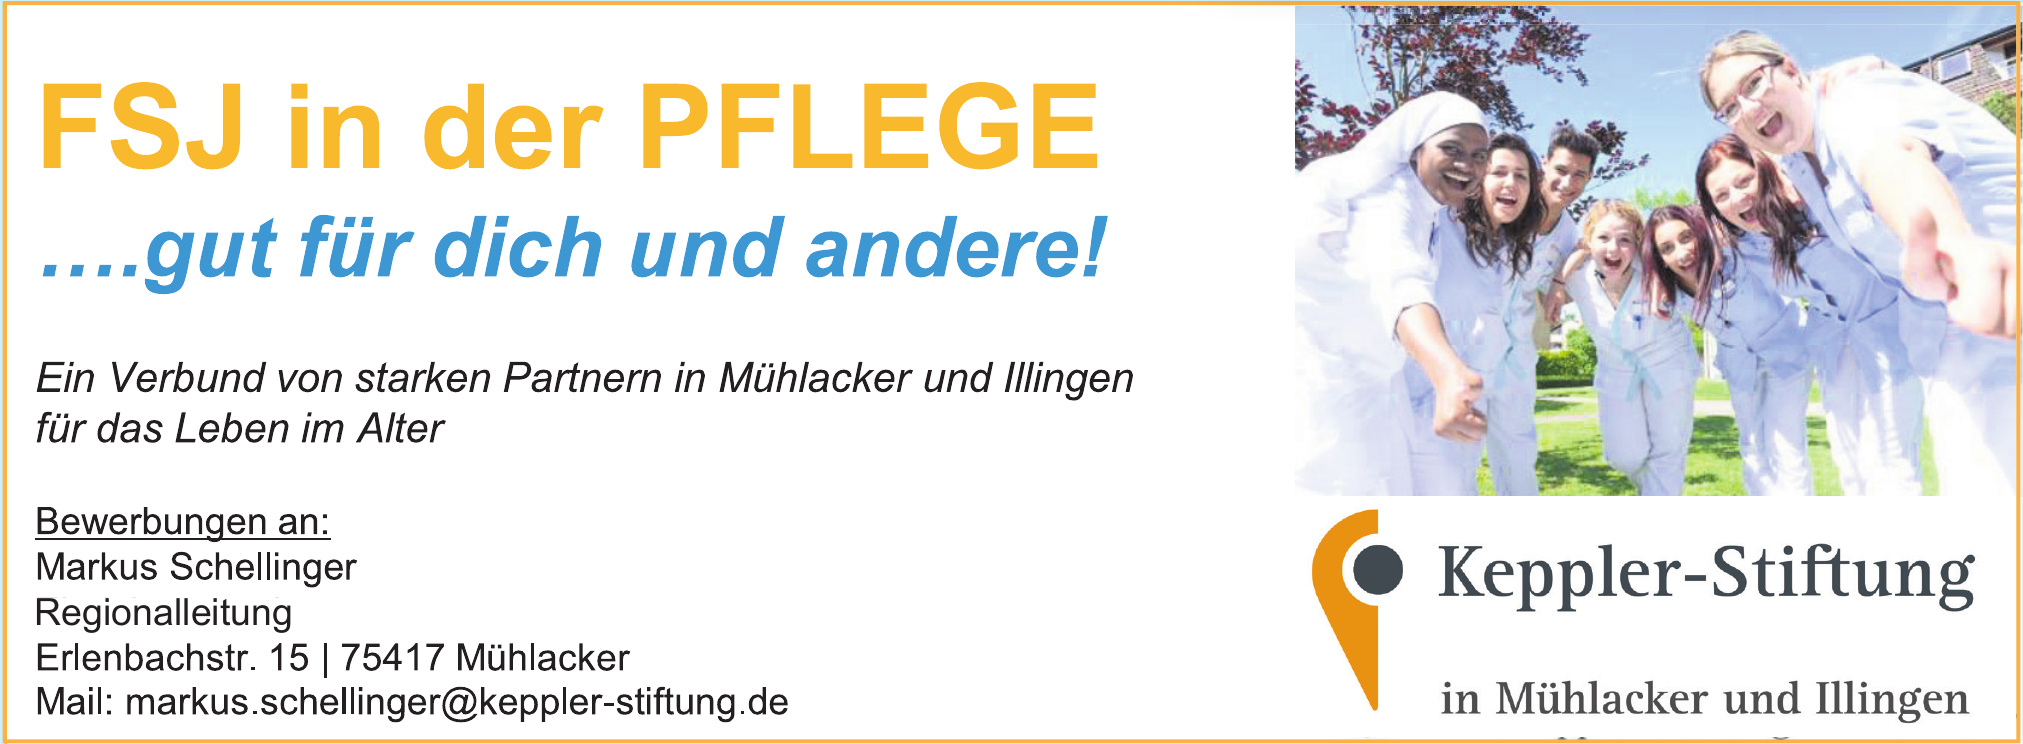 Keppler-Stiftung